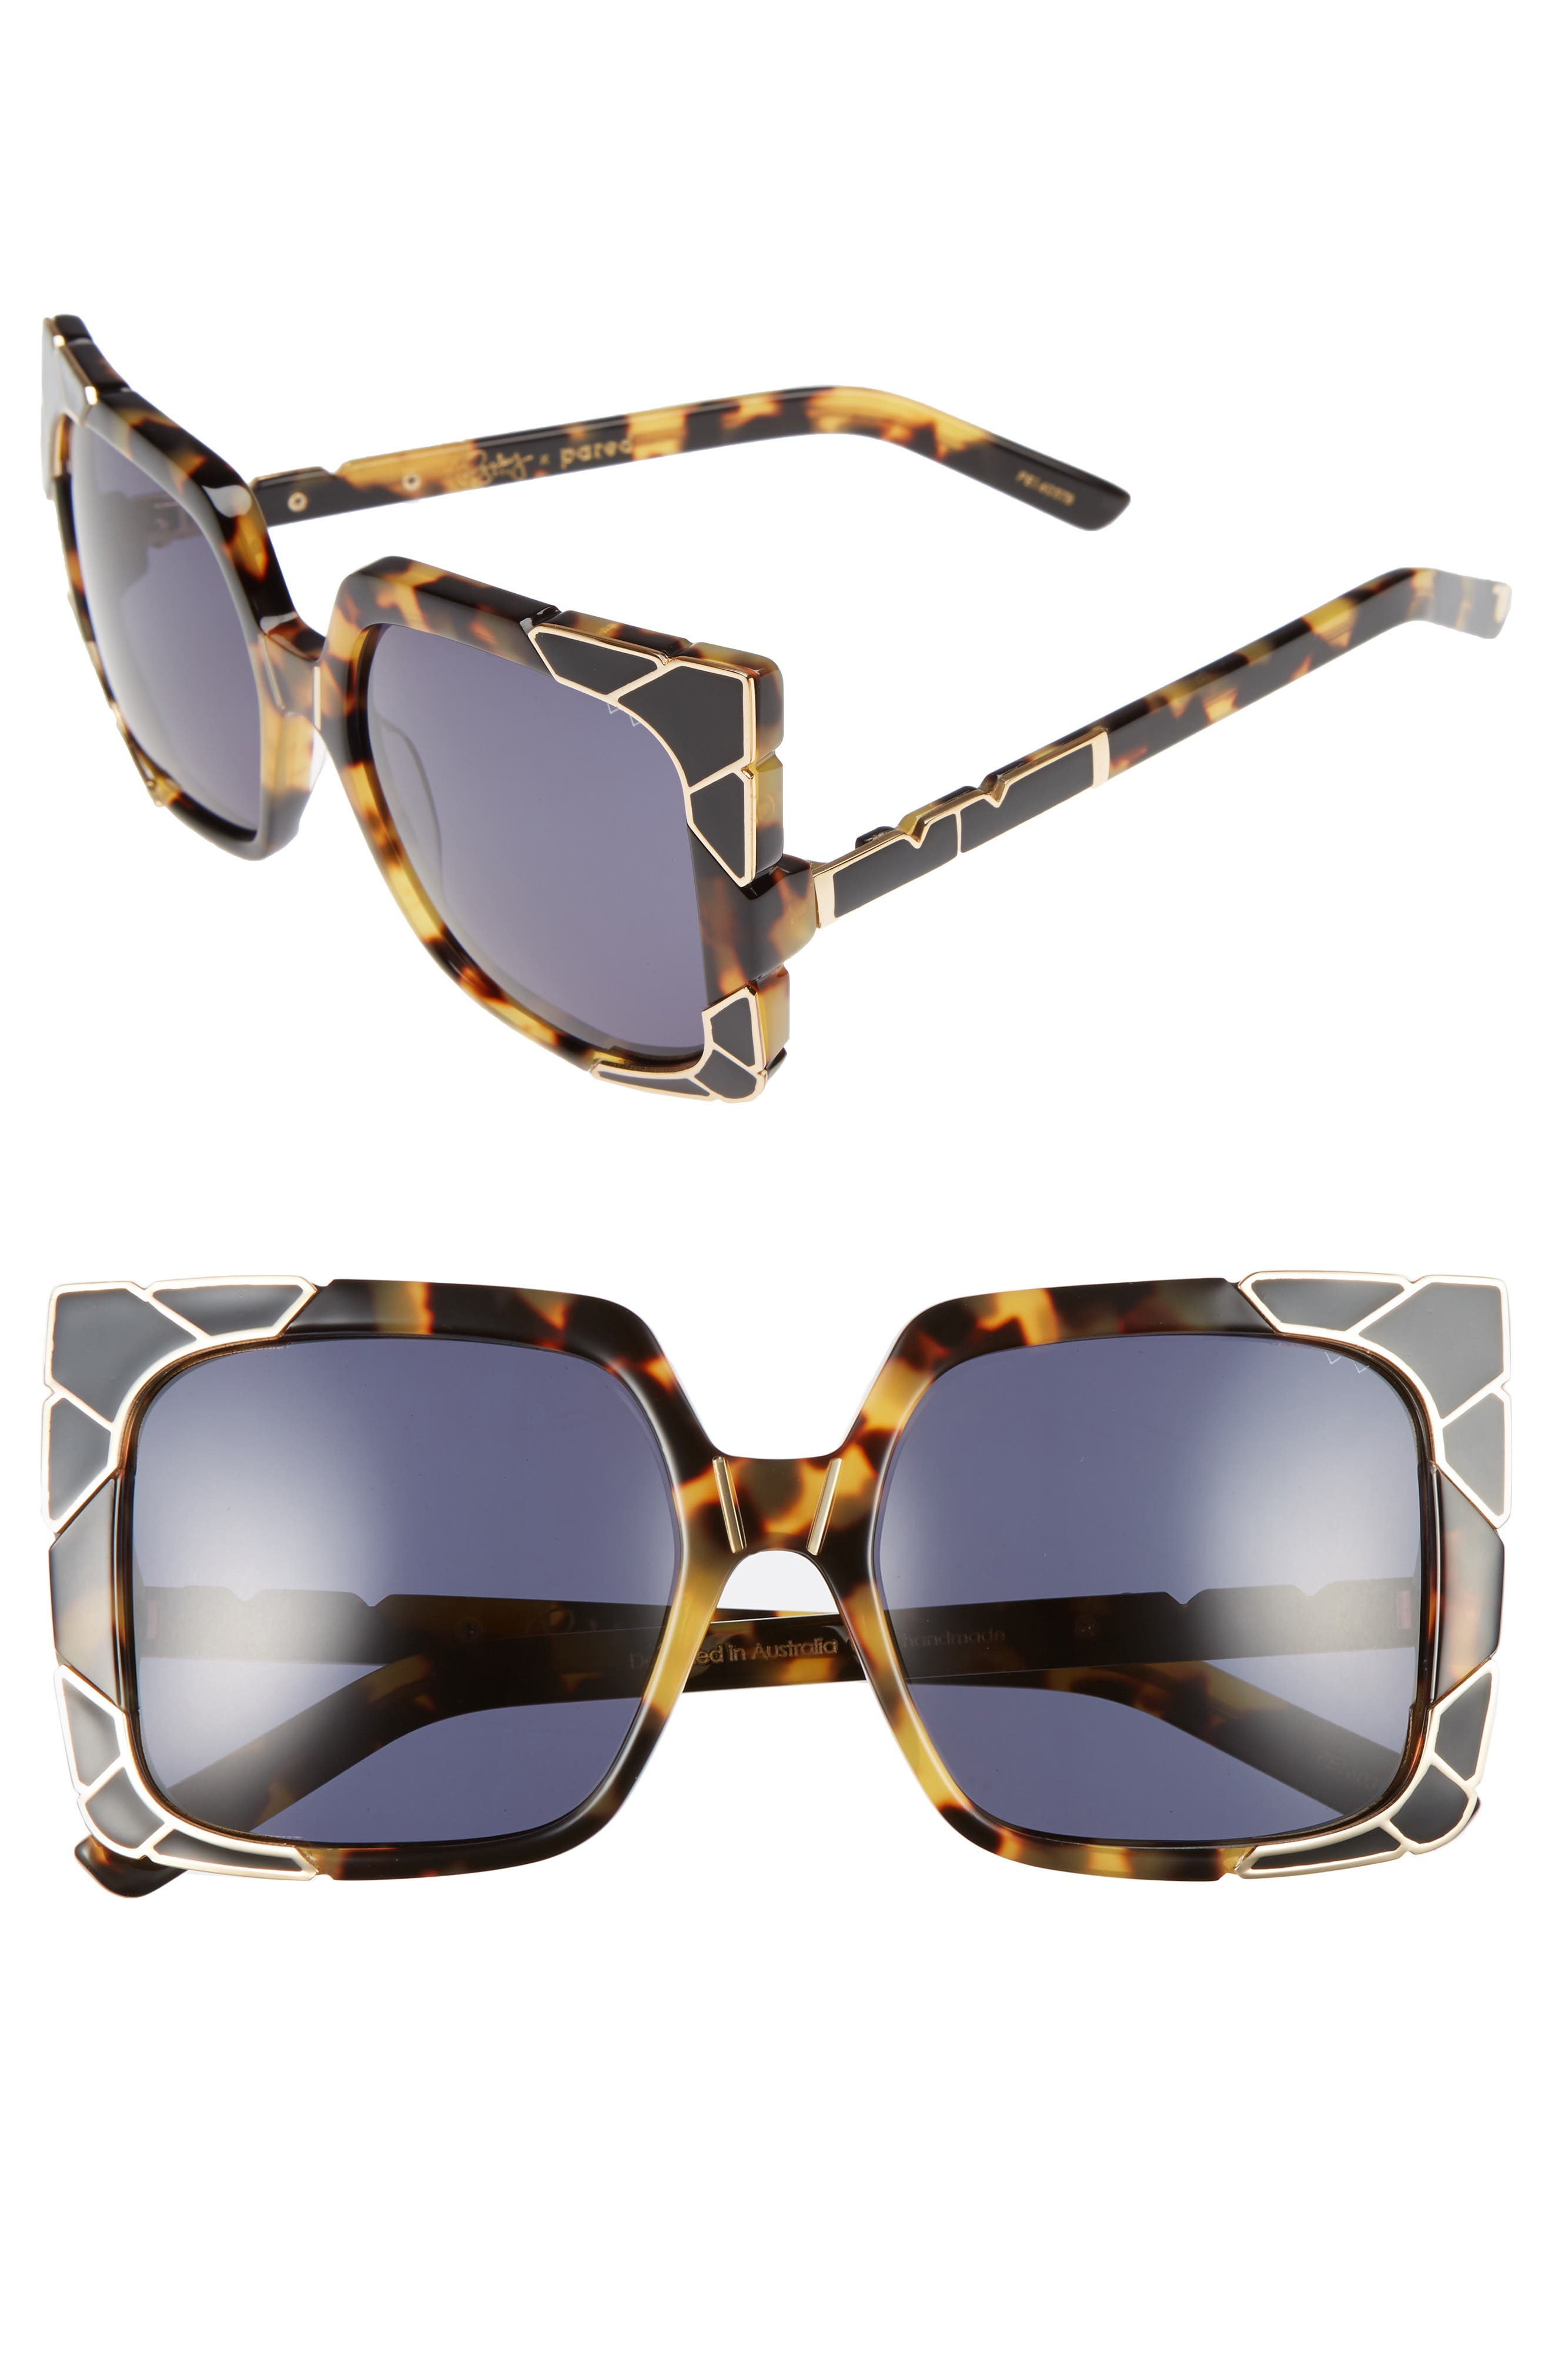 Sun & Shade 55mm Square Retro Sunglasses,                             Main thumbnail 1, color,                             DARK TORTOISE/ GOLD/ GREY